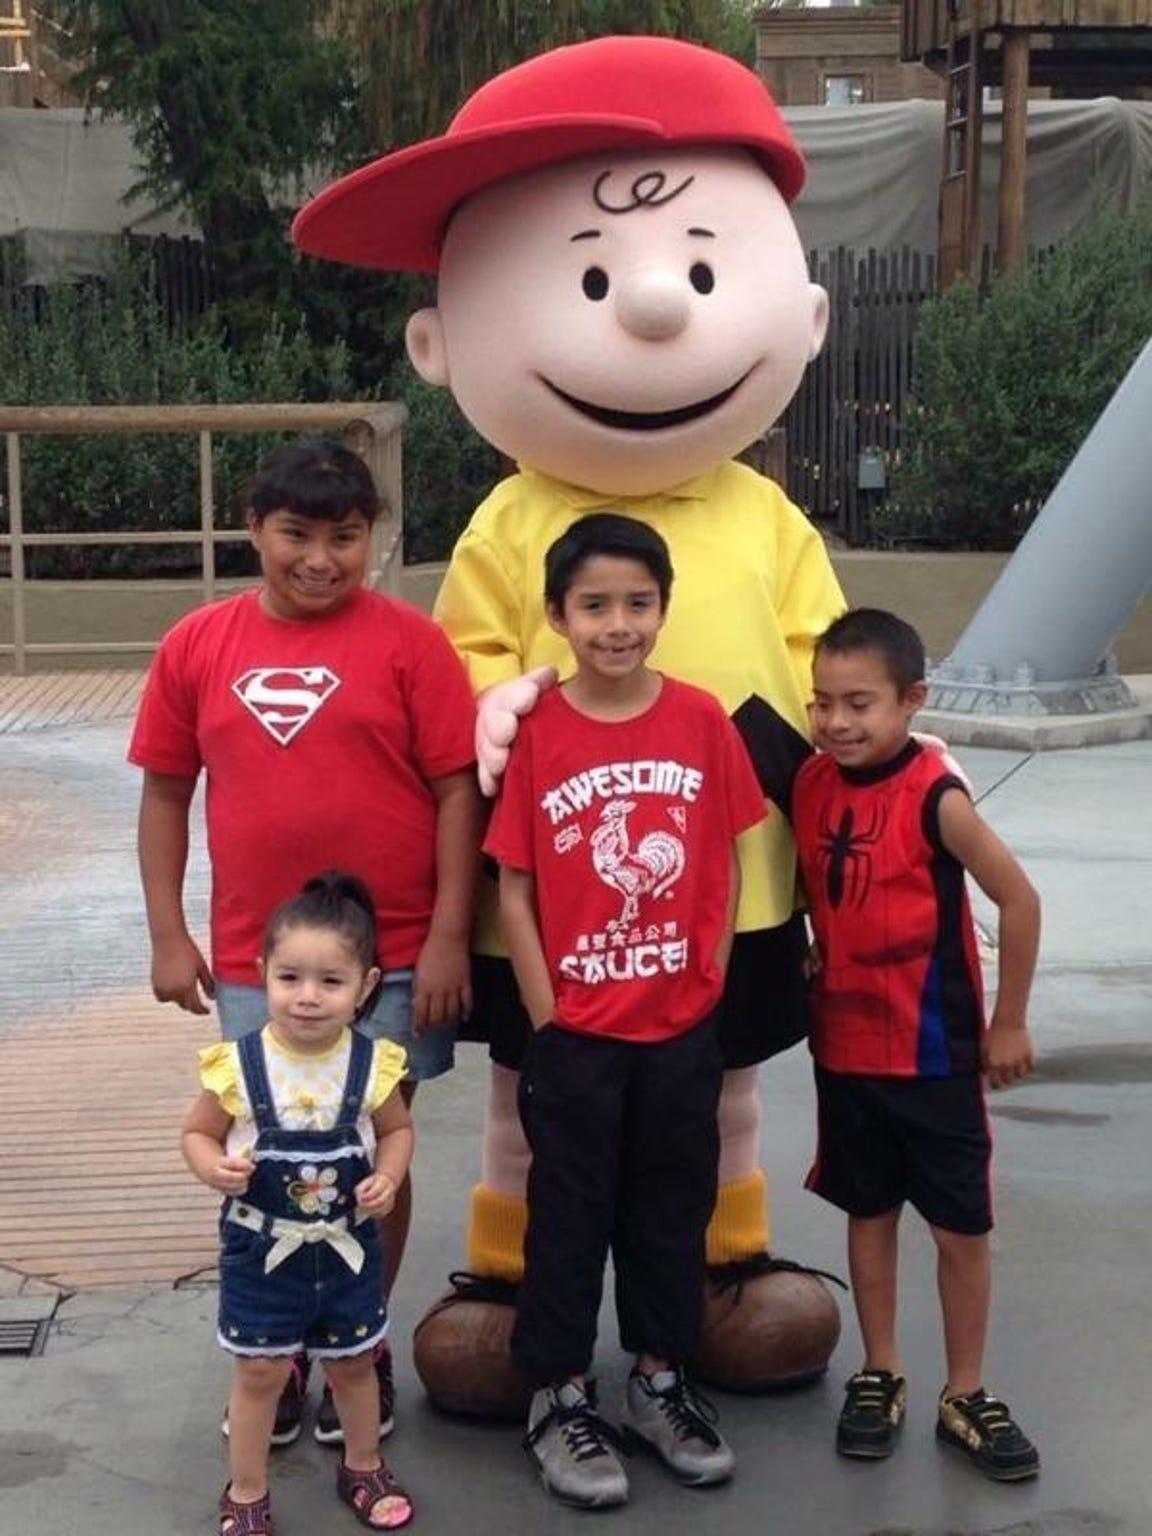 The Guajardo Family -- Jalissa, 11; Kathryn, 2; Isaac, Jr., 8; Ruben, 9.